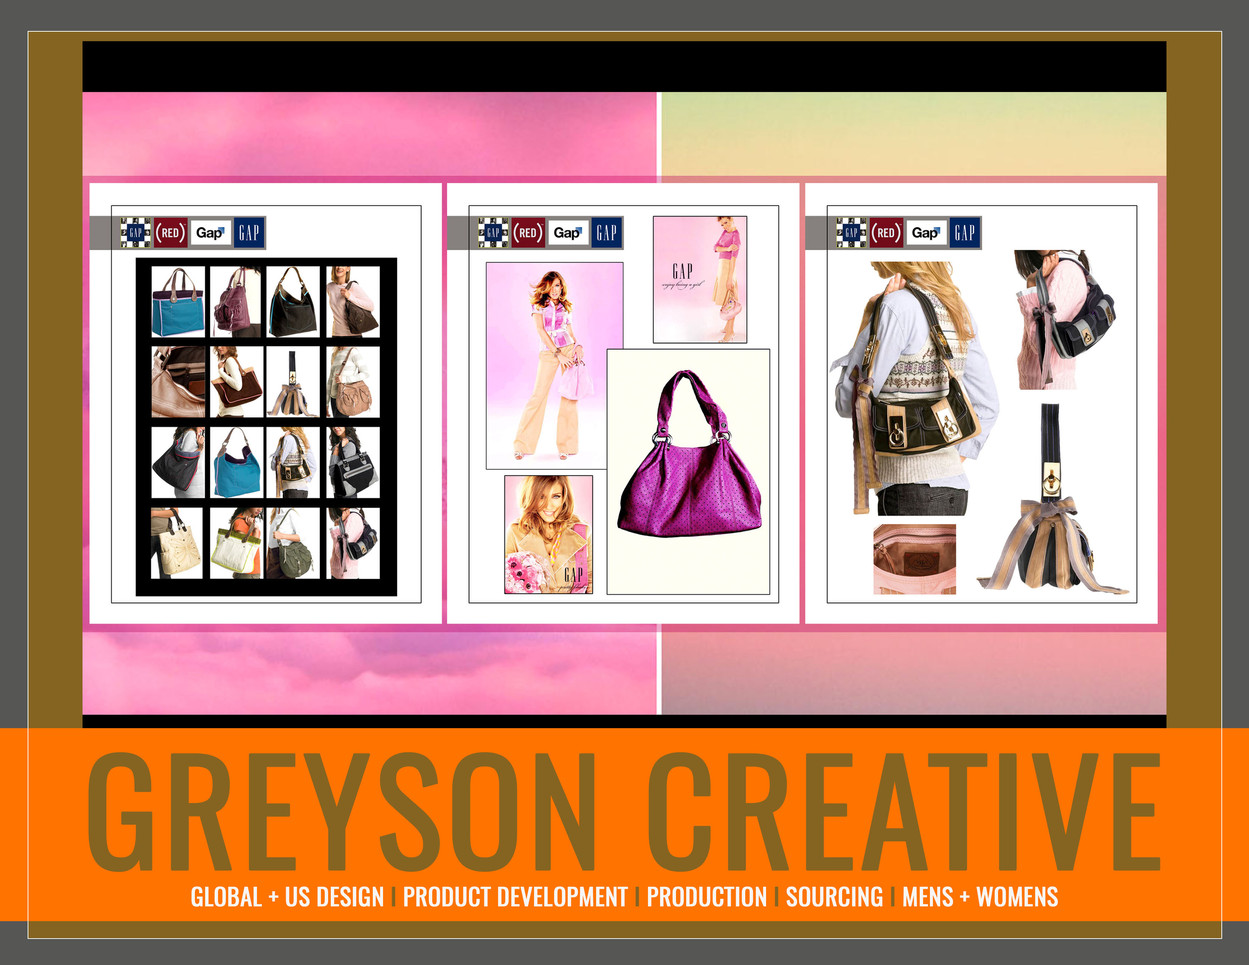 GAP: Greyson Creative by Lukas Greyson